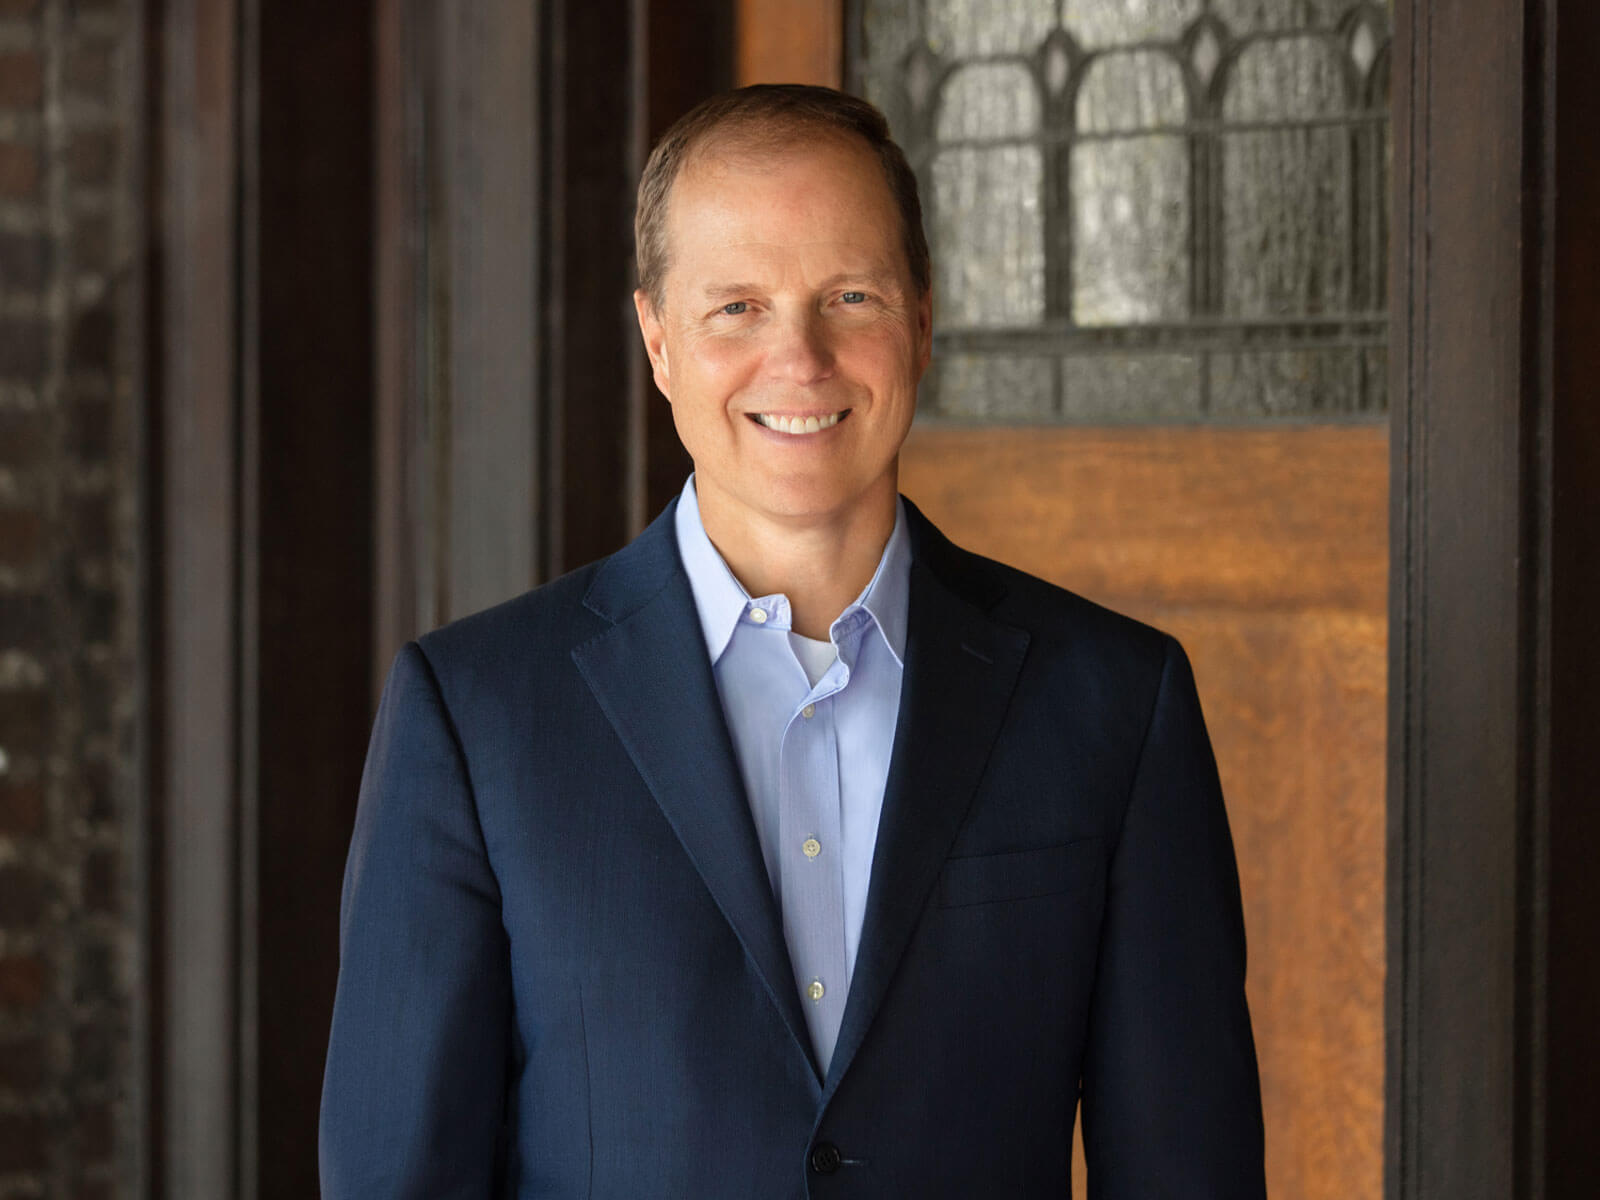 Mark Johnson, co-founder of Innosight